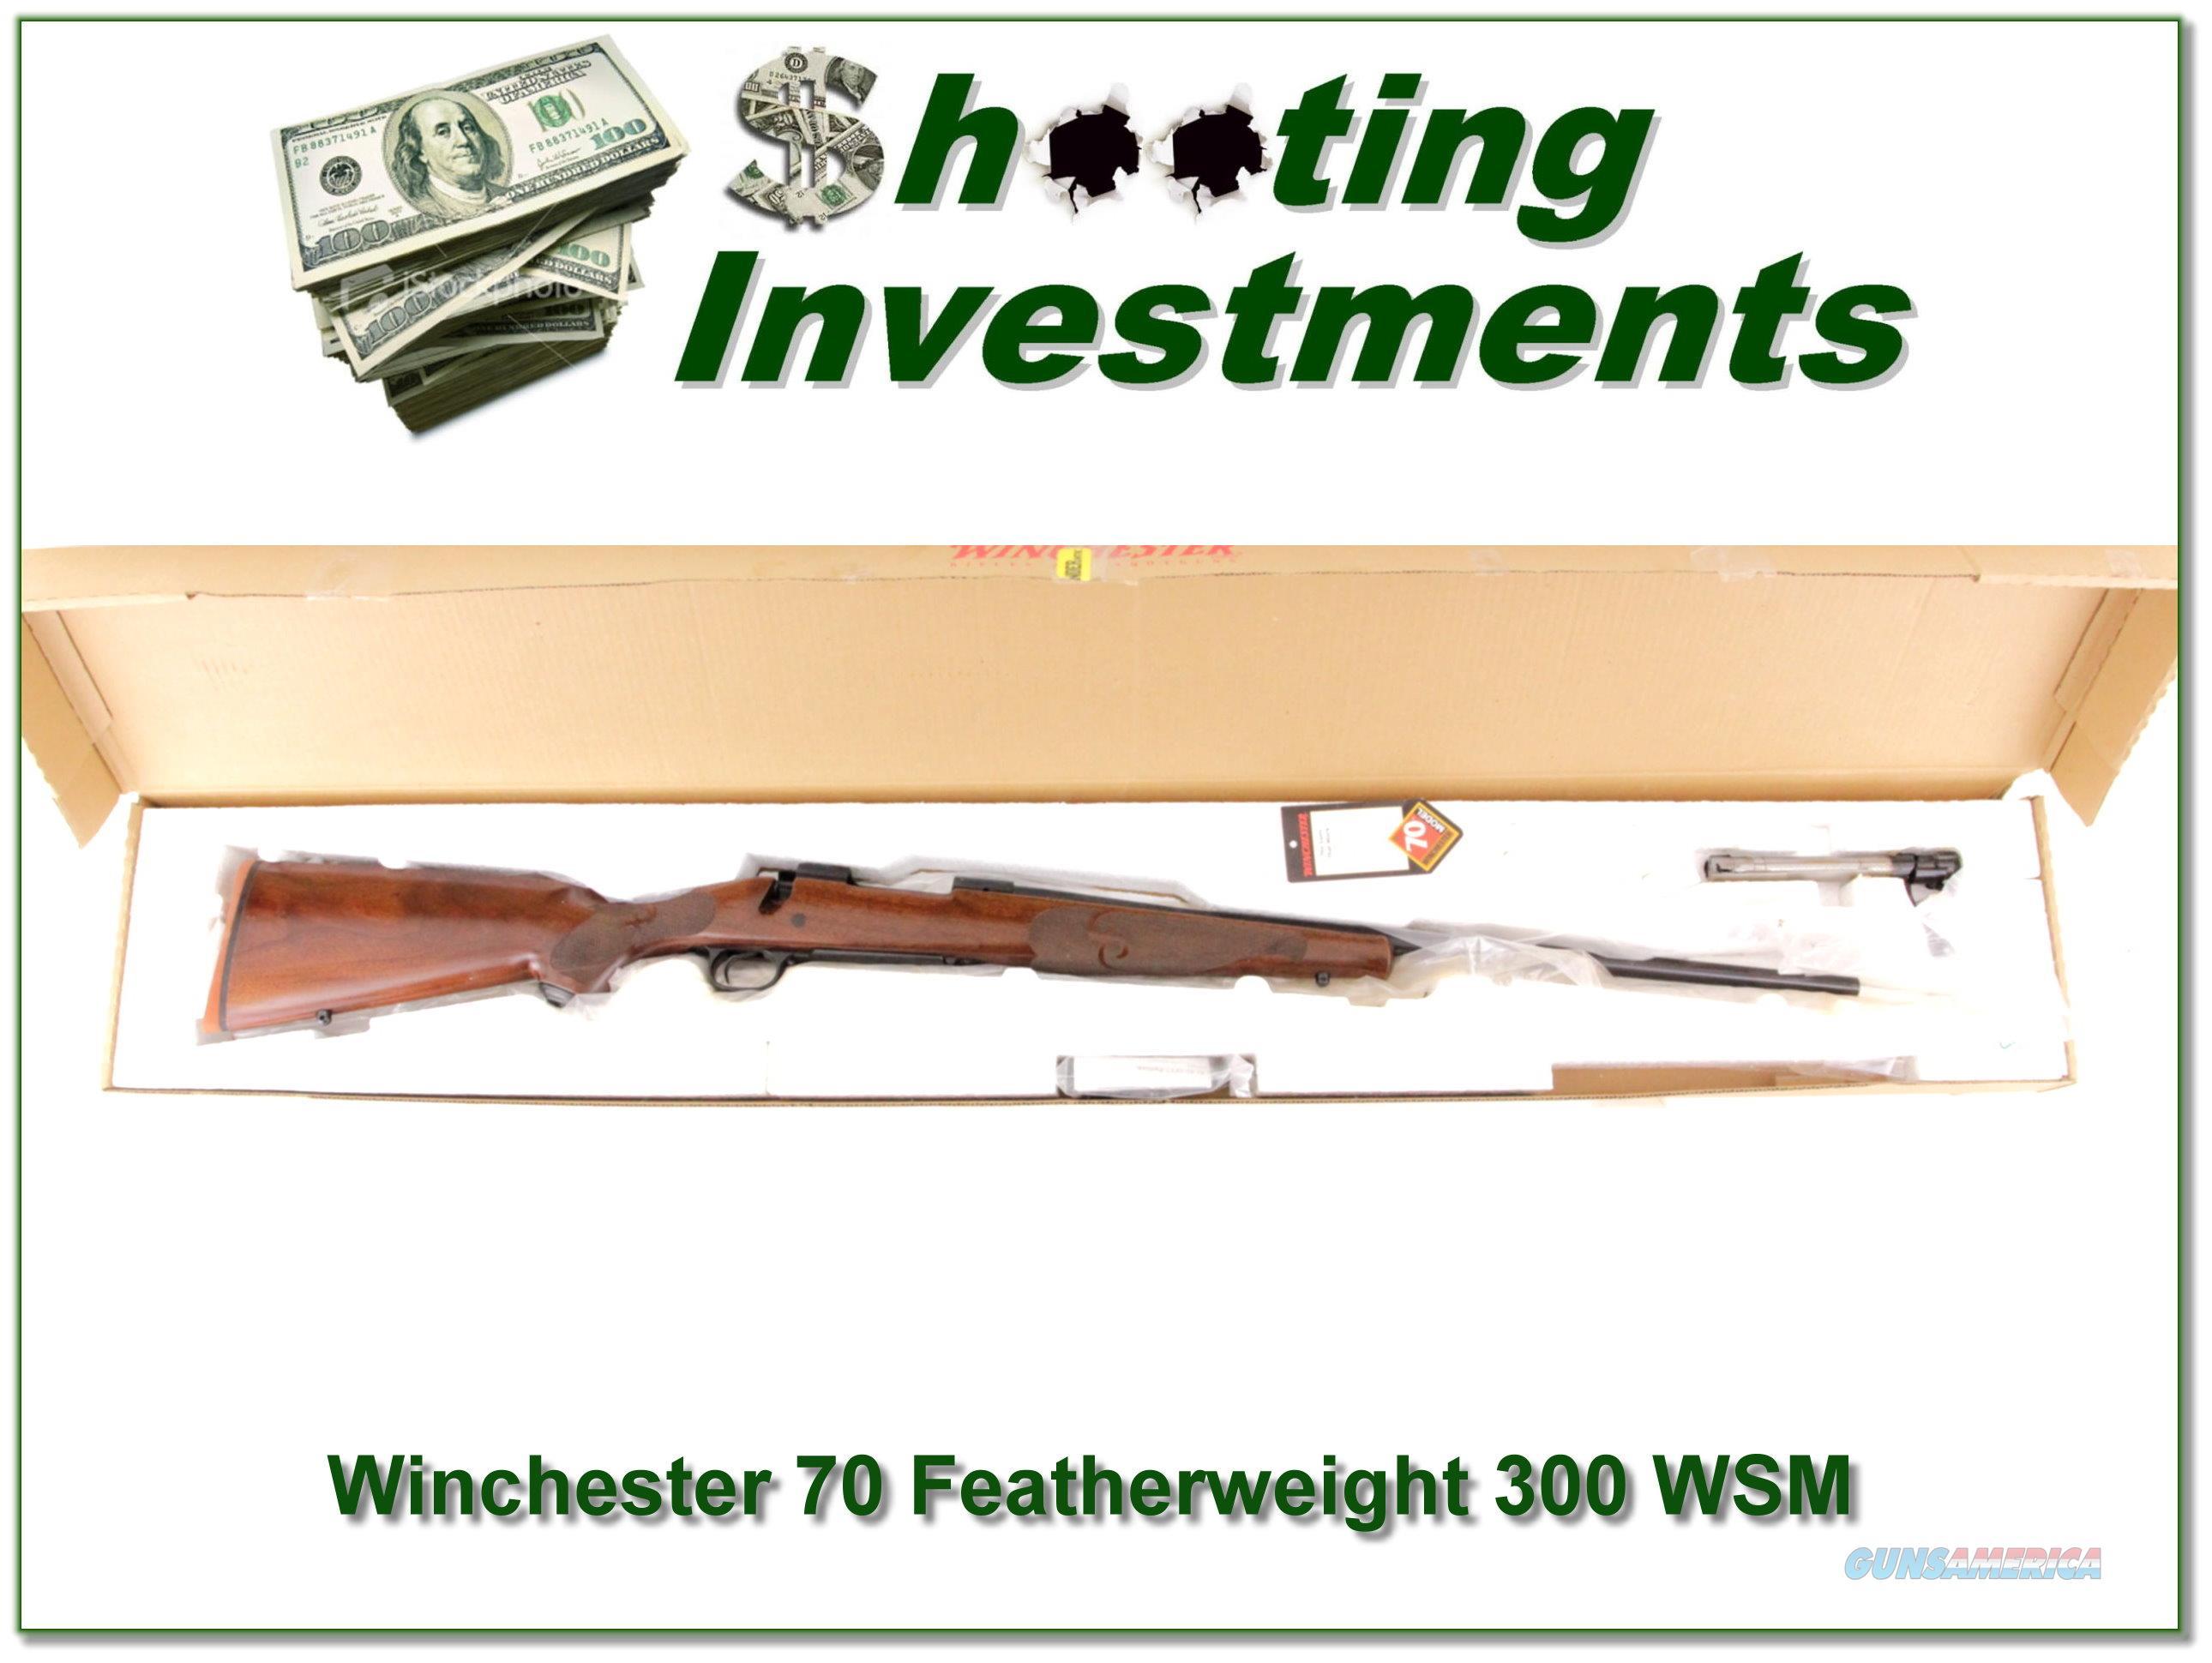 Winchester Model 70 Featherweight 300 WSM ANIB  Guns > Rifles > Winchester Rifles - Modern Bolt/Auto/Single > Model 70 > Post-64